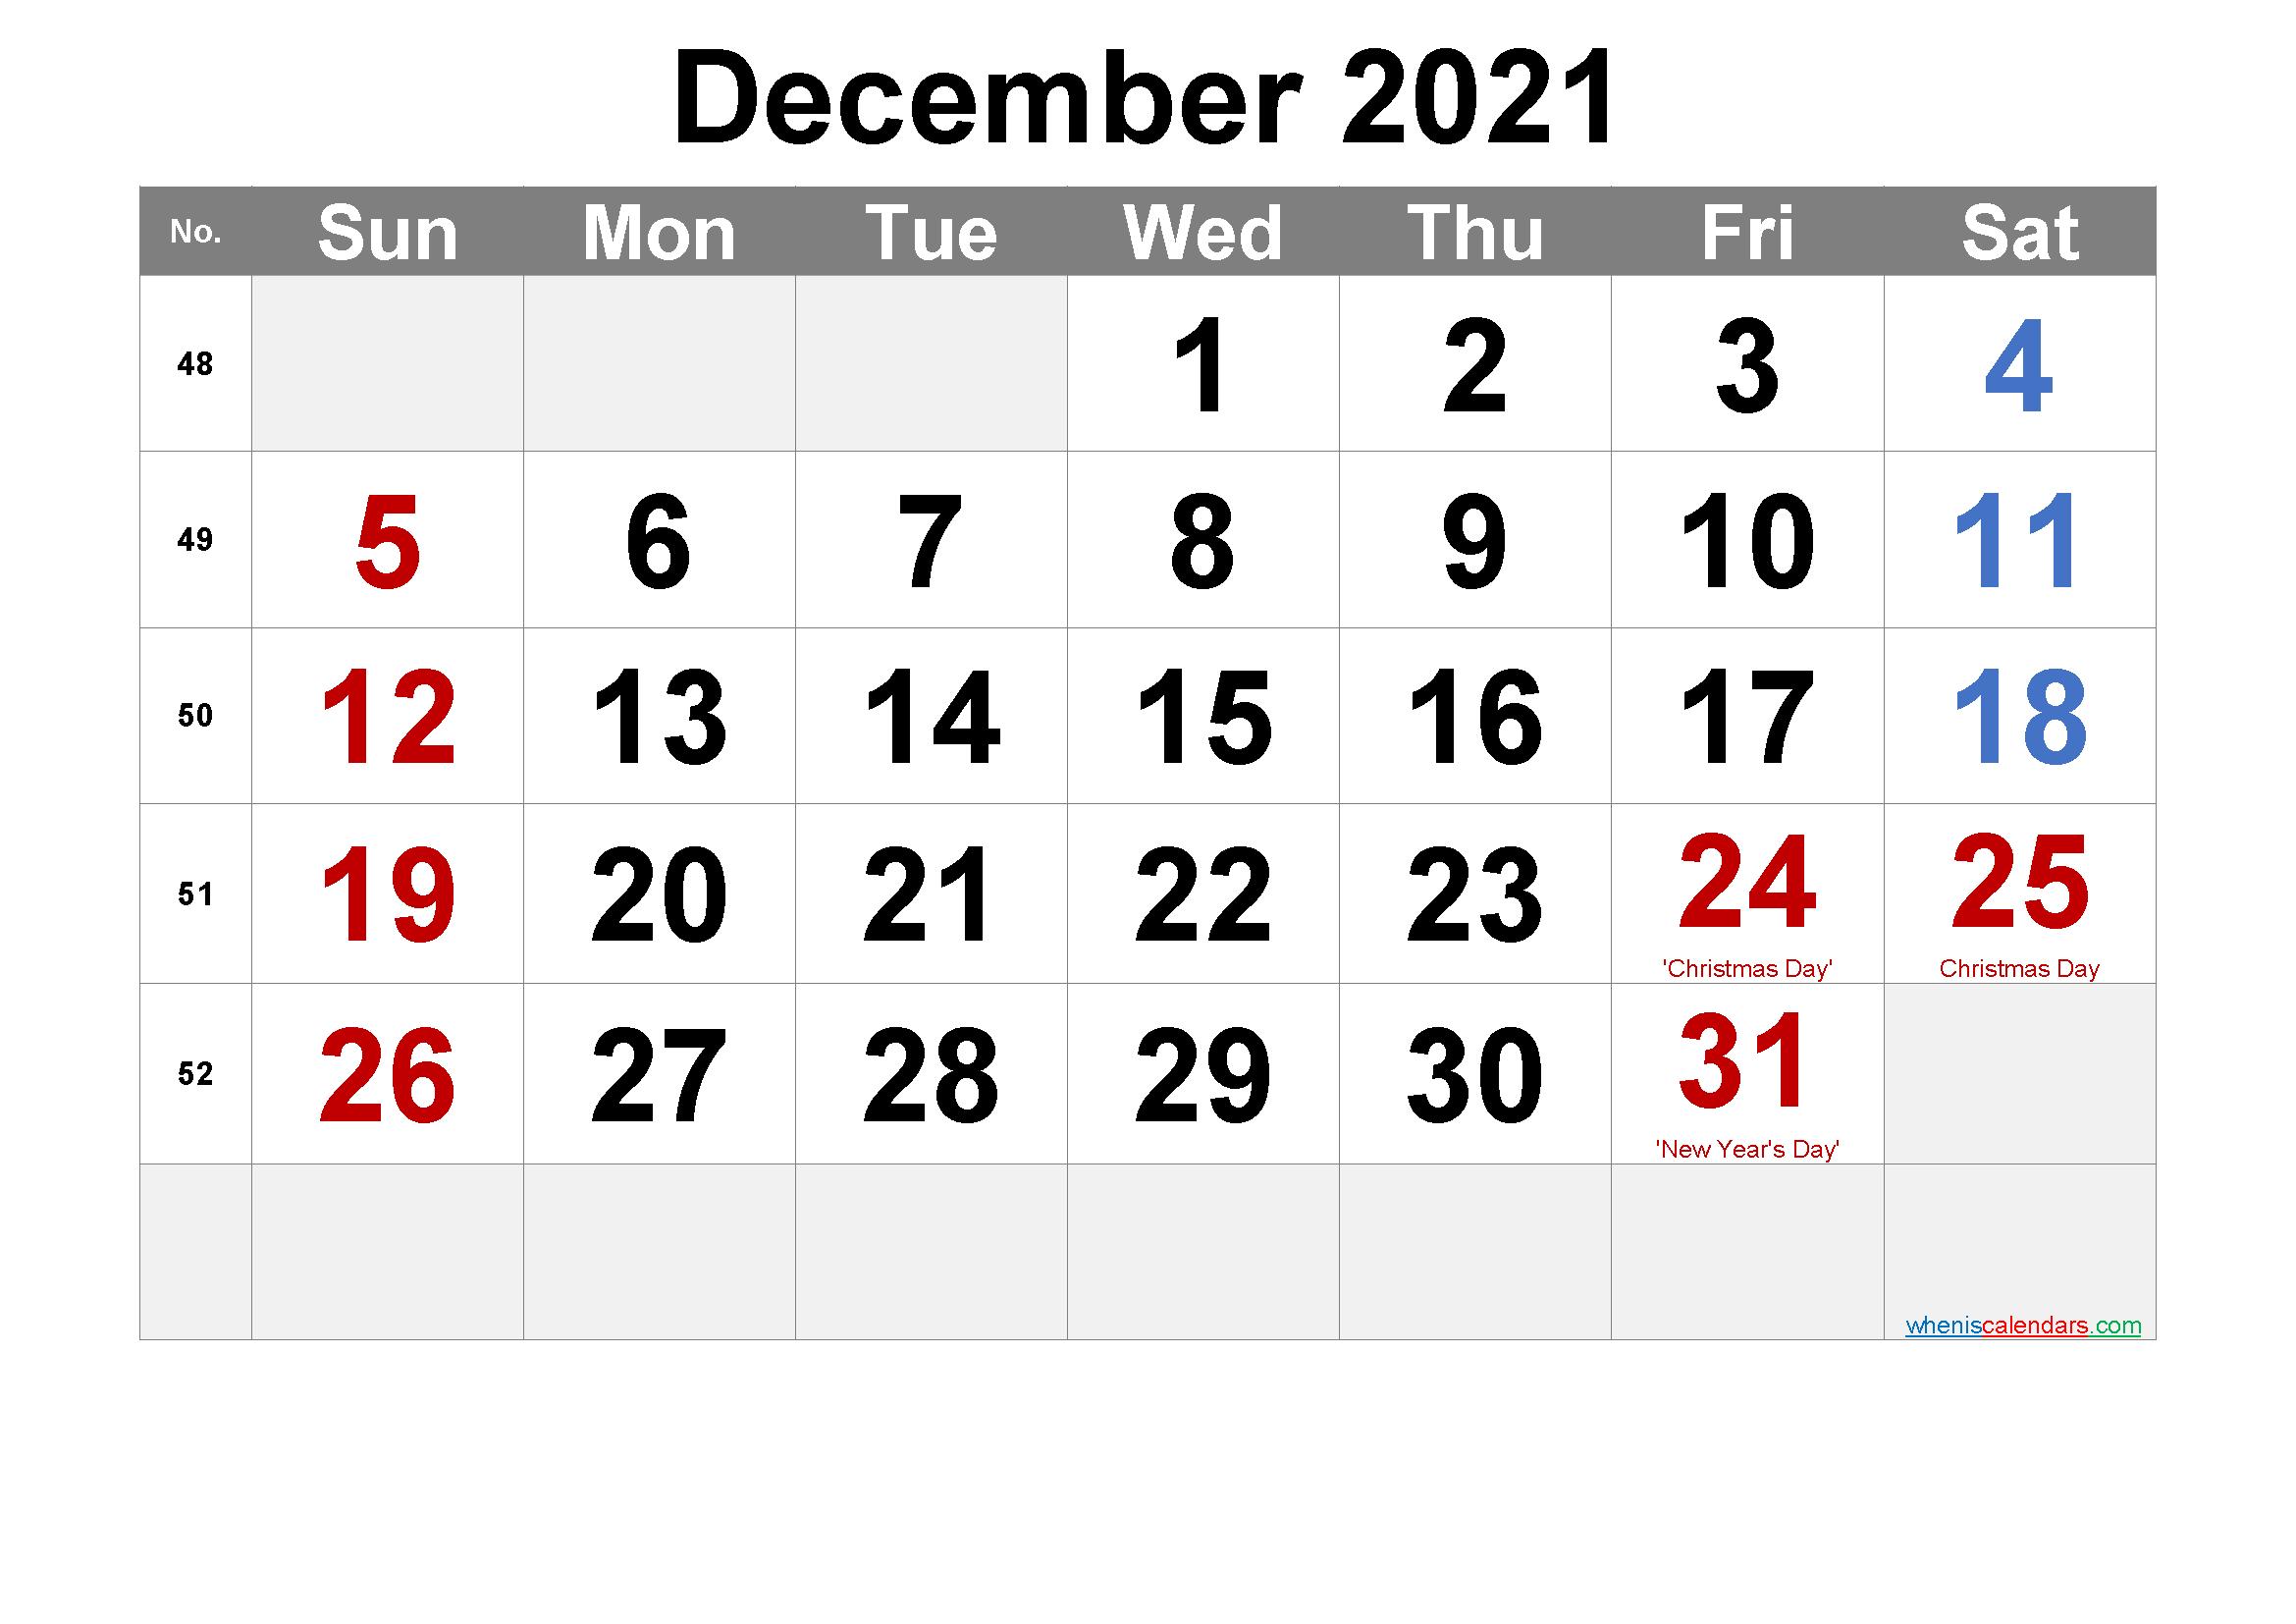 December 2021 Printable Calendar With Holidays - 6 Templates December Calendar Of 2021